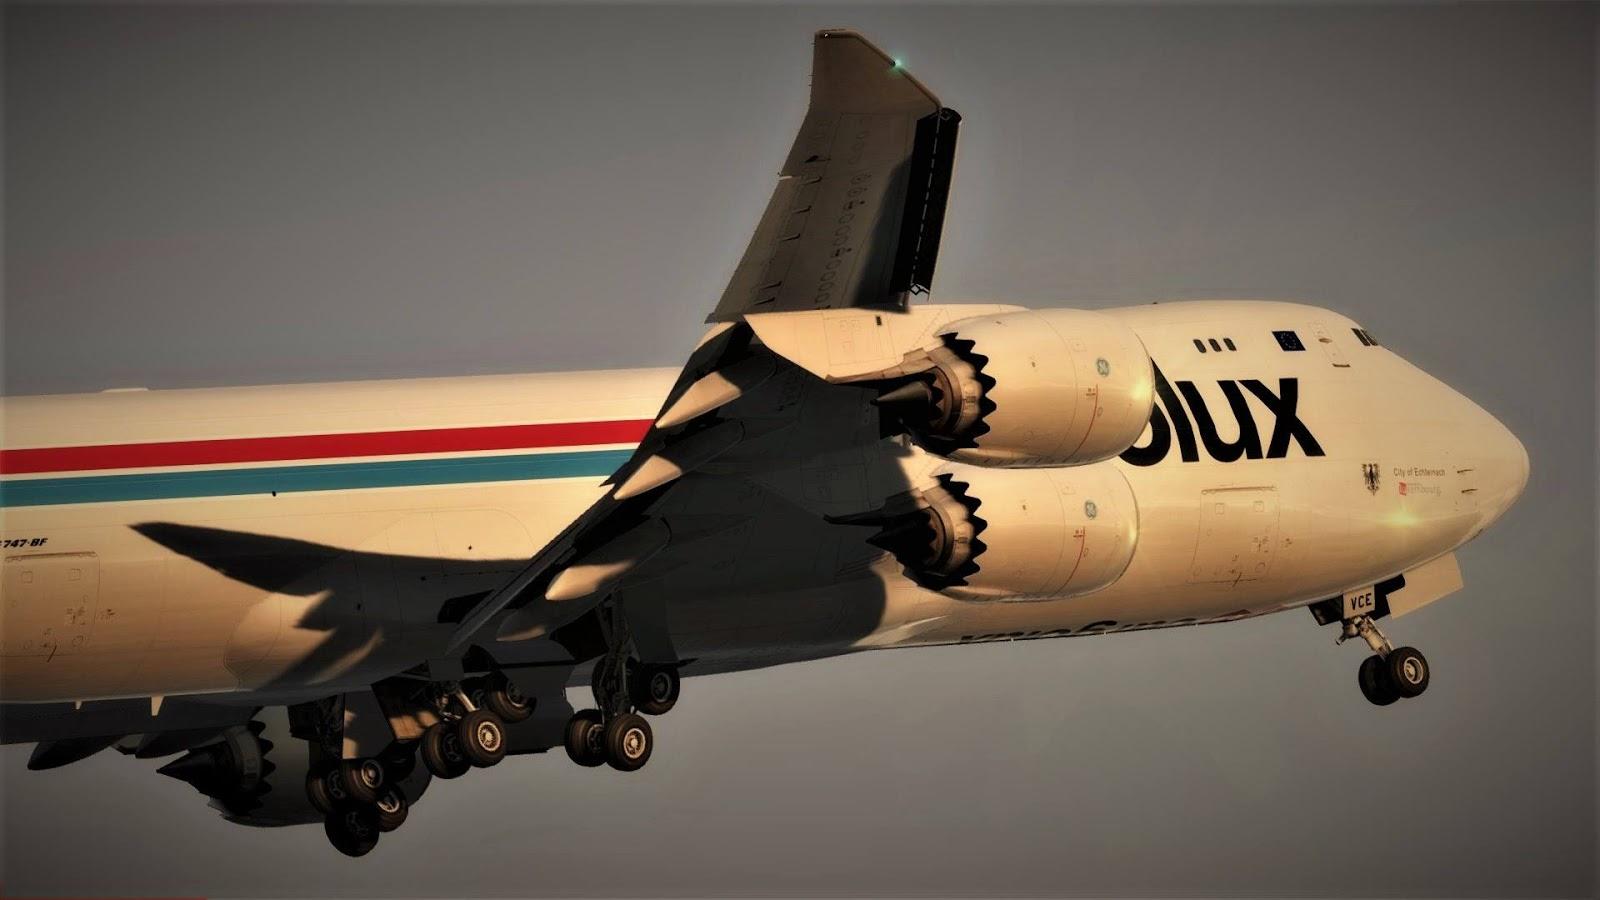 P3Dv4] - PMDG 747-400 747-8 QOTSII FINAL GAUGES